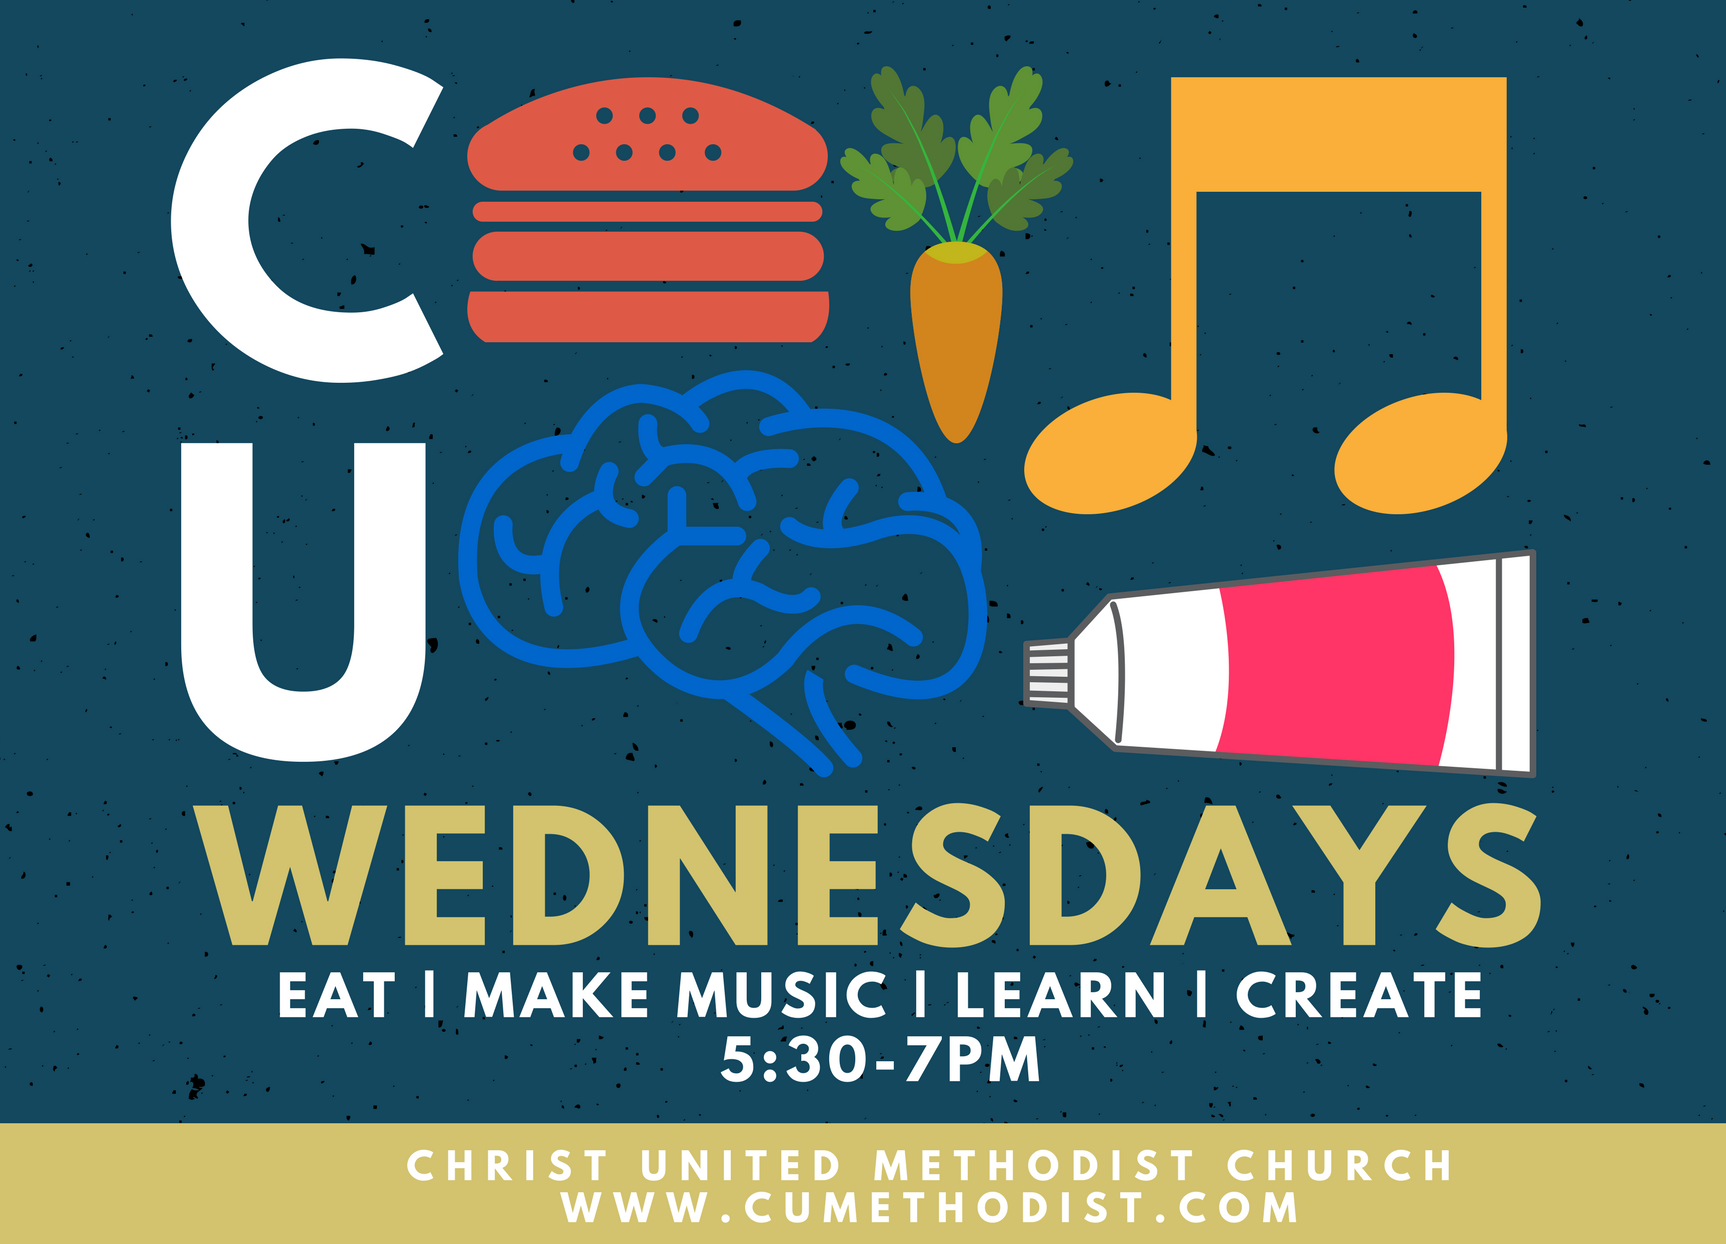 C U Wednesdays logo (1).png